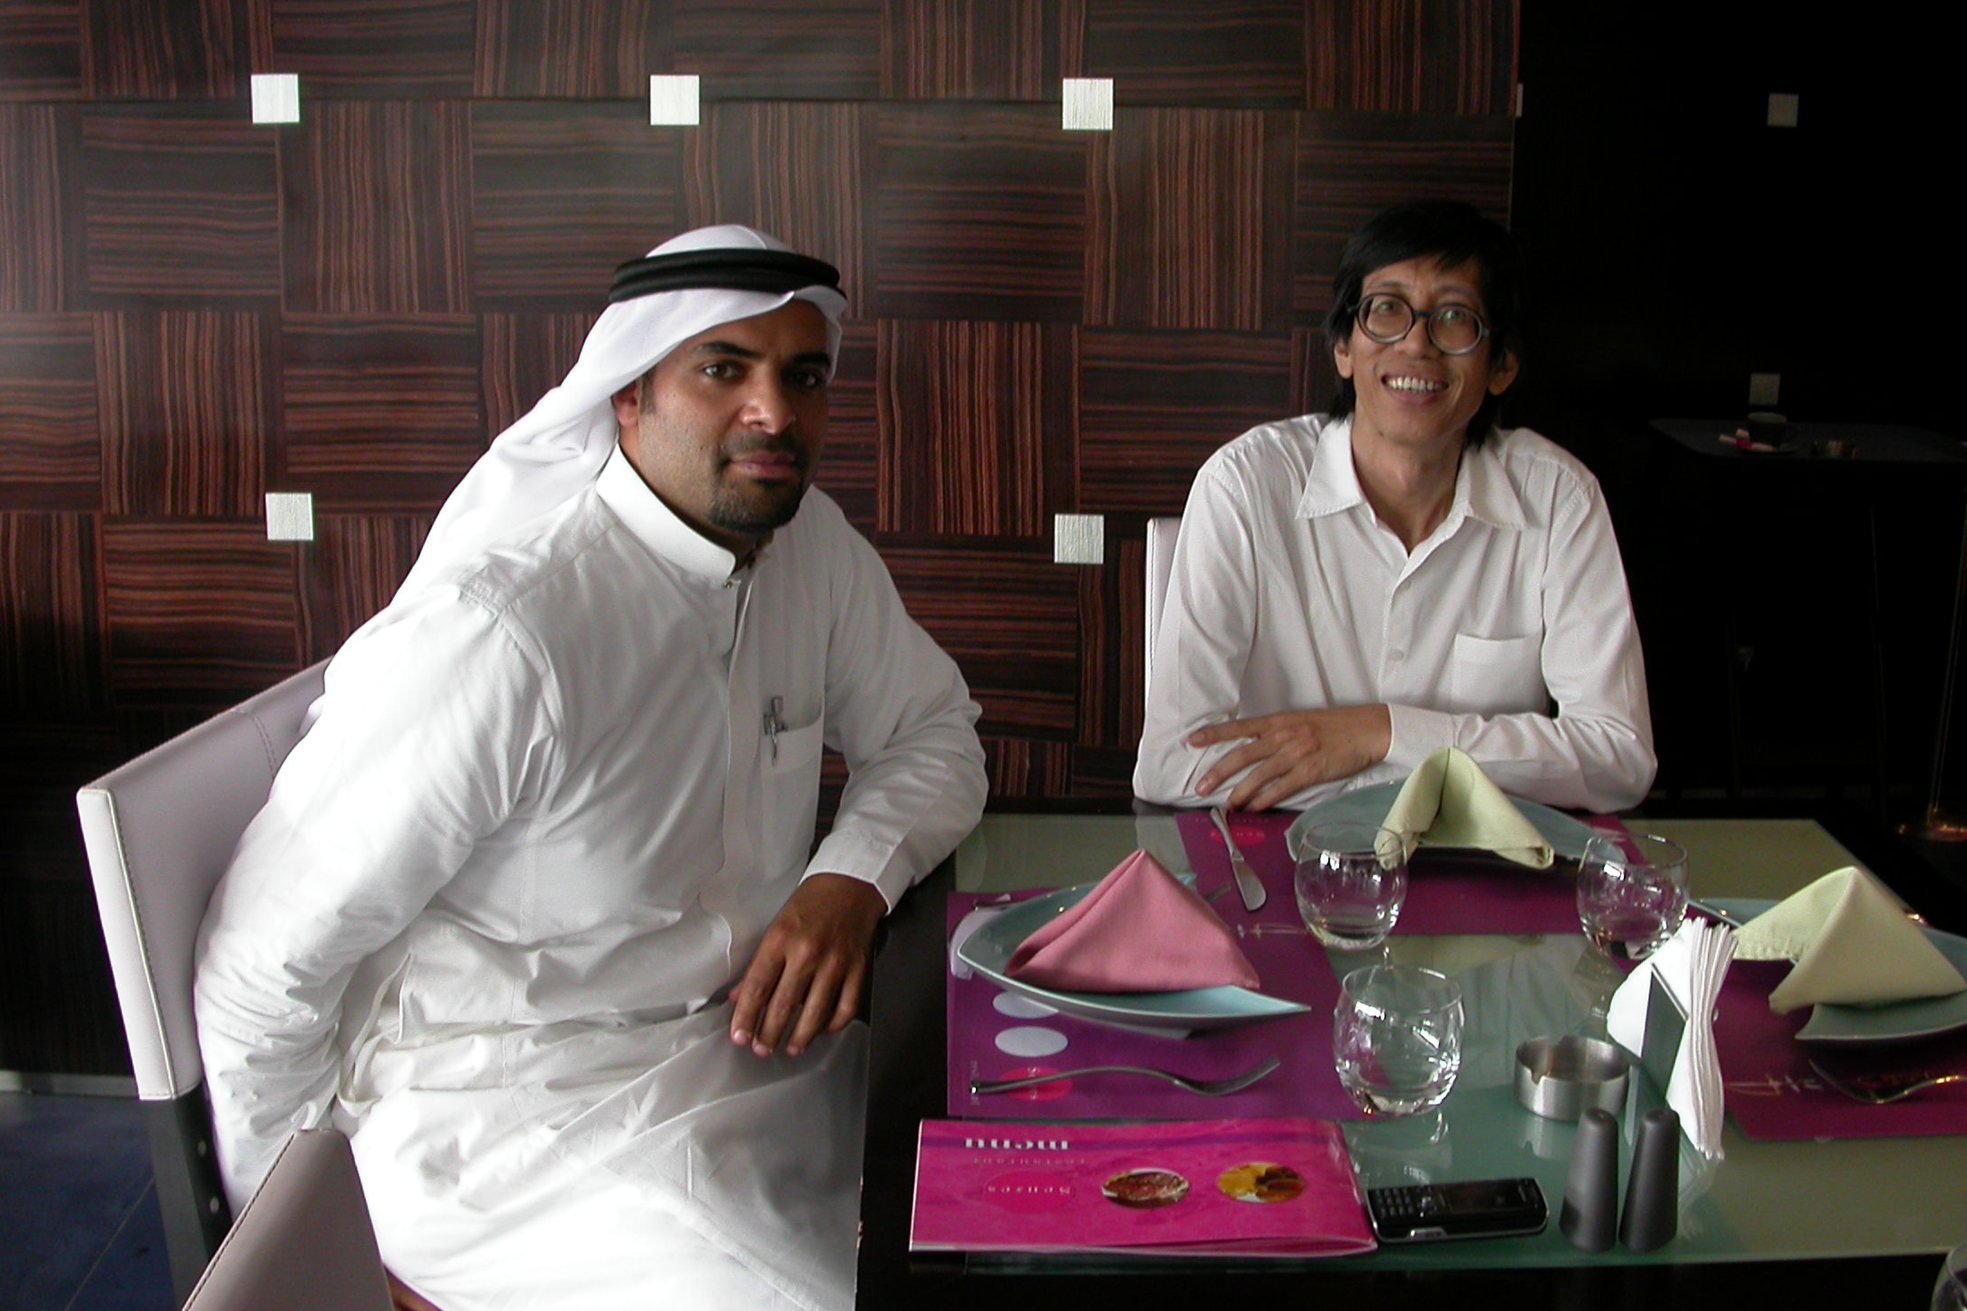 whwWeb_About_whw_Activities_SA_Jeddah_Reda and William.jpg